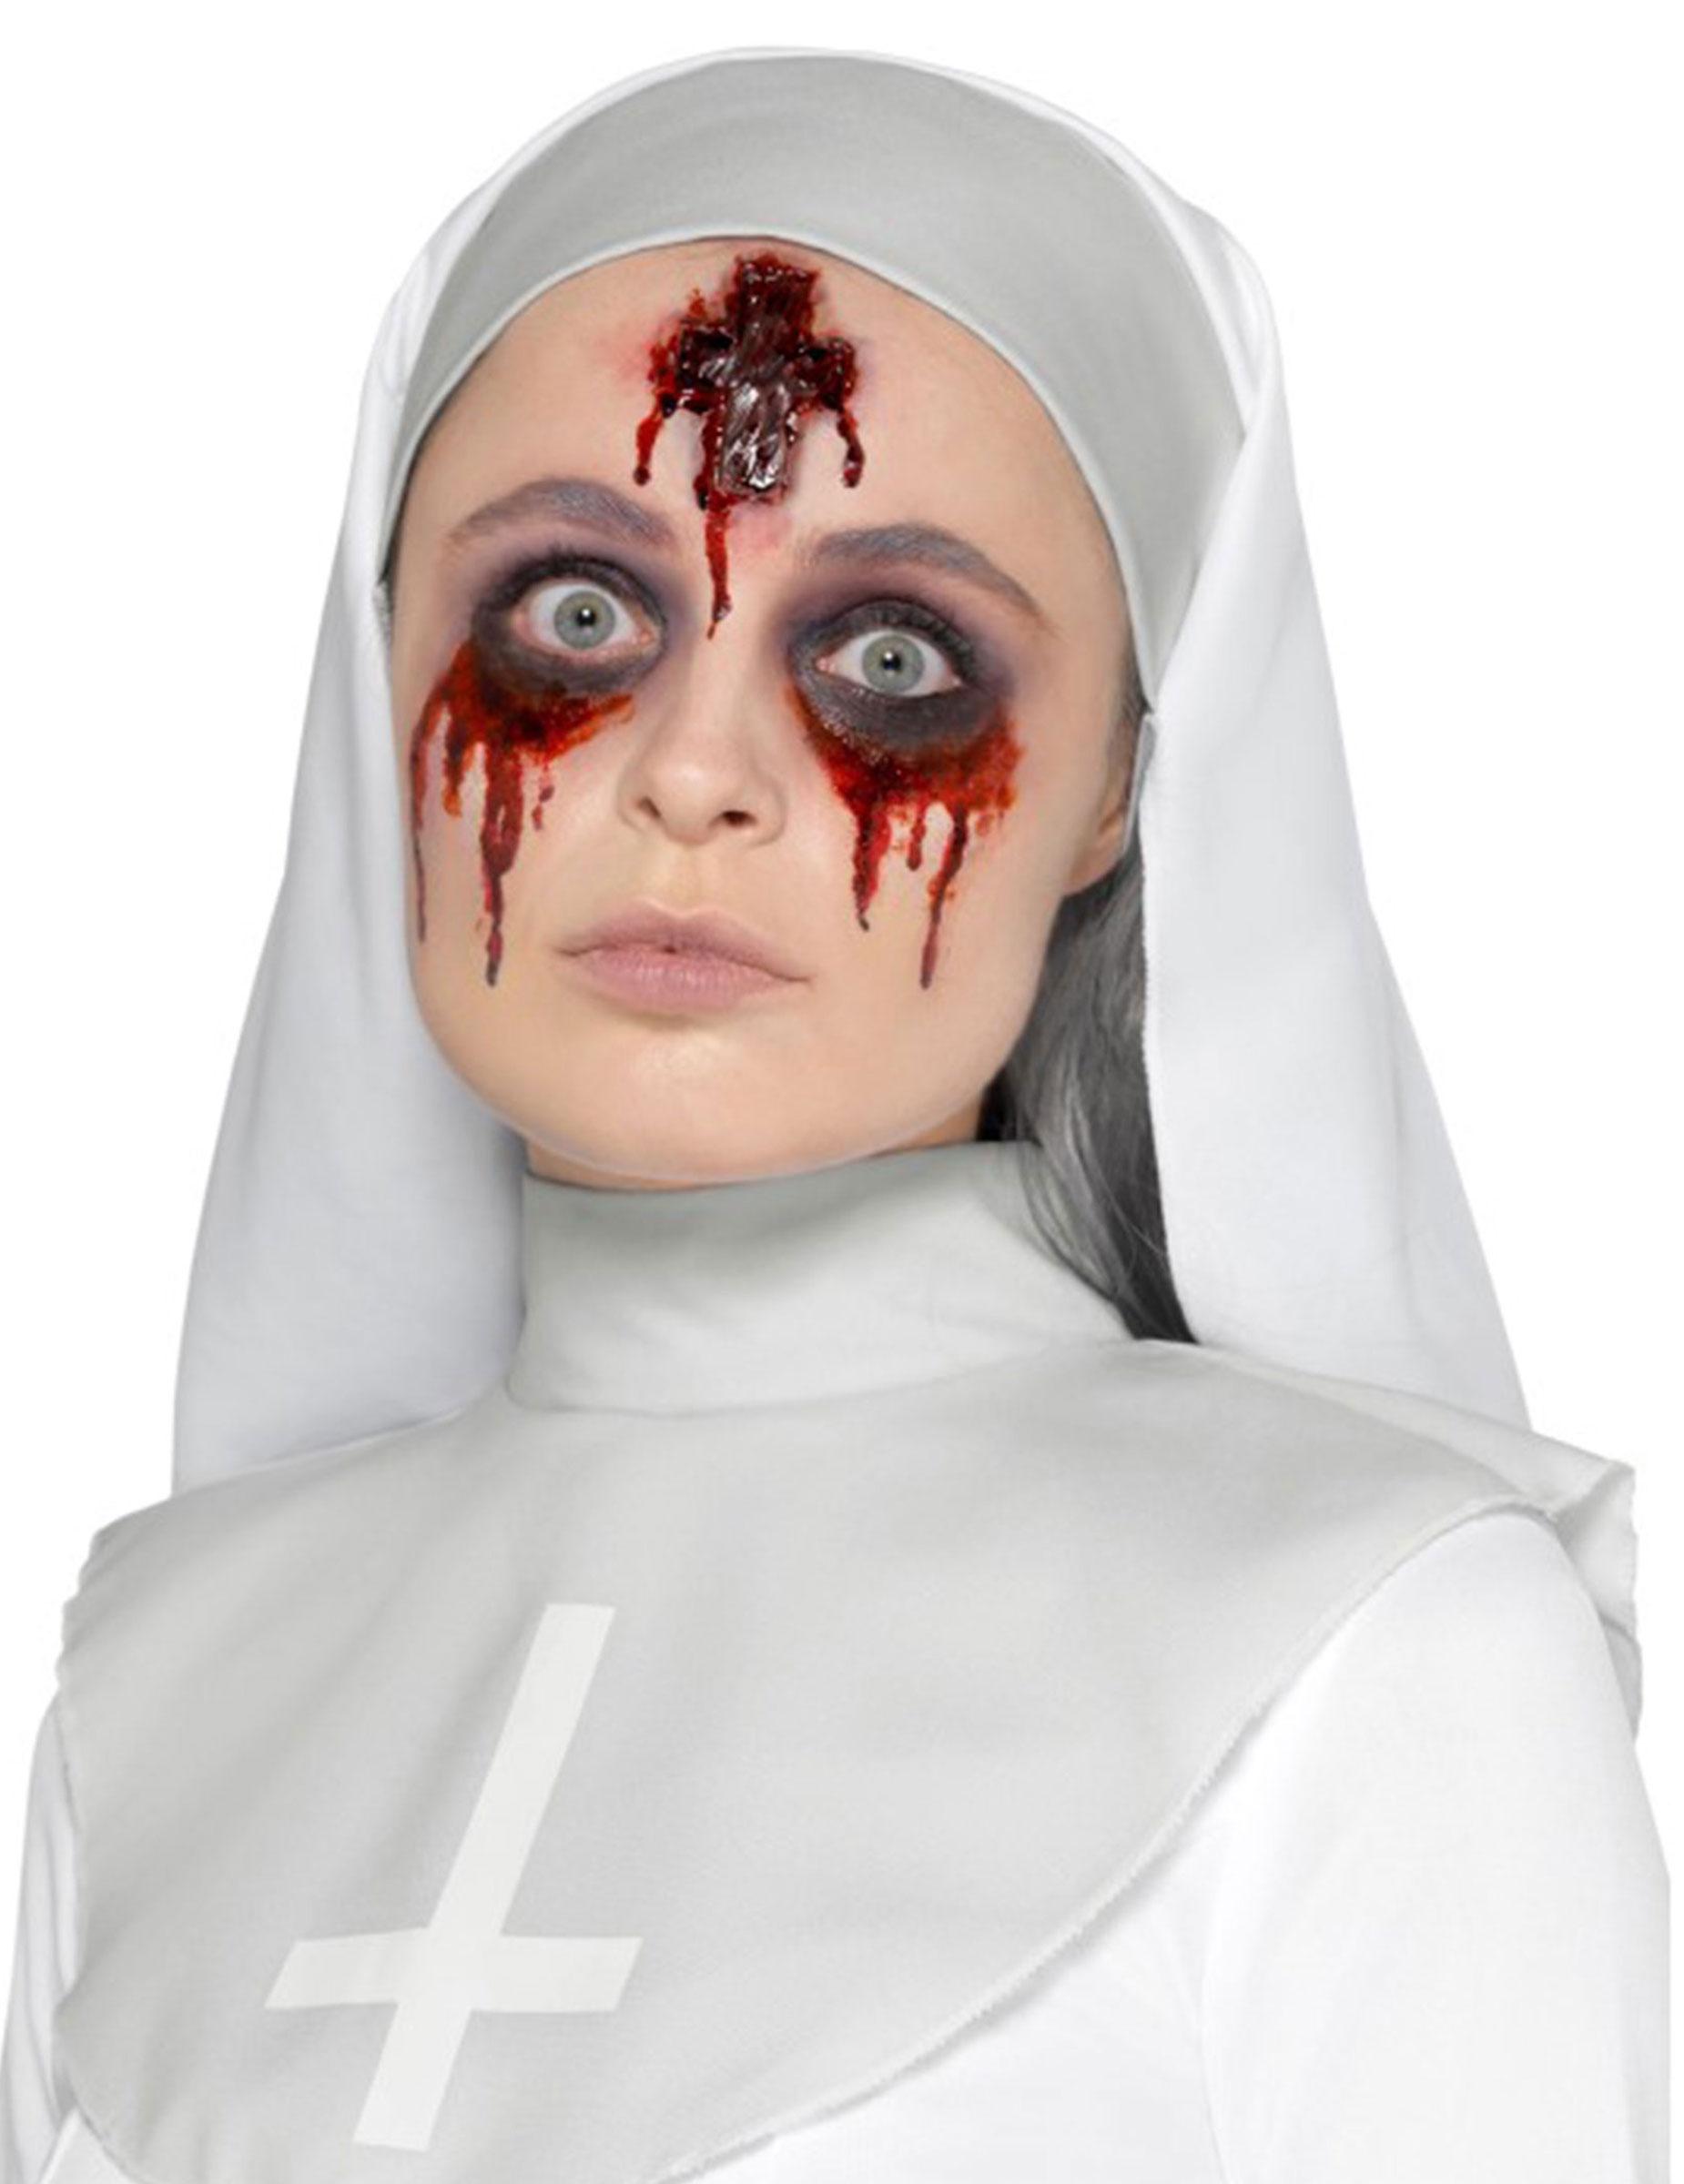 Kunstliche Wunde Kruzifix Halloween Makeup Rot Gunstige Faschings